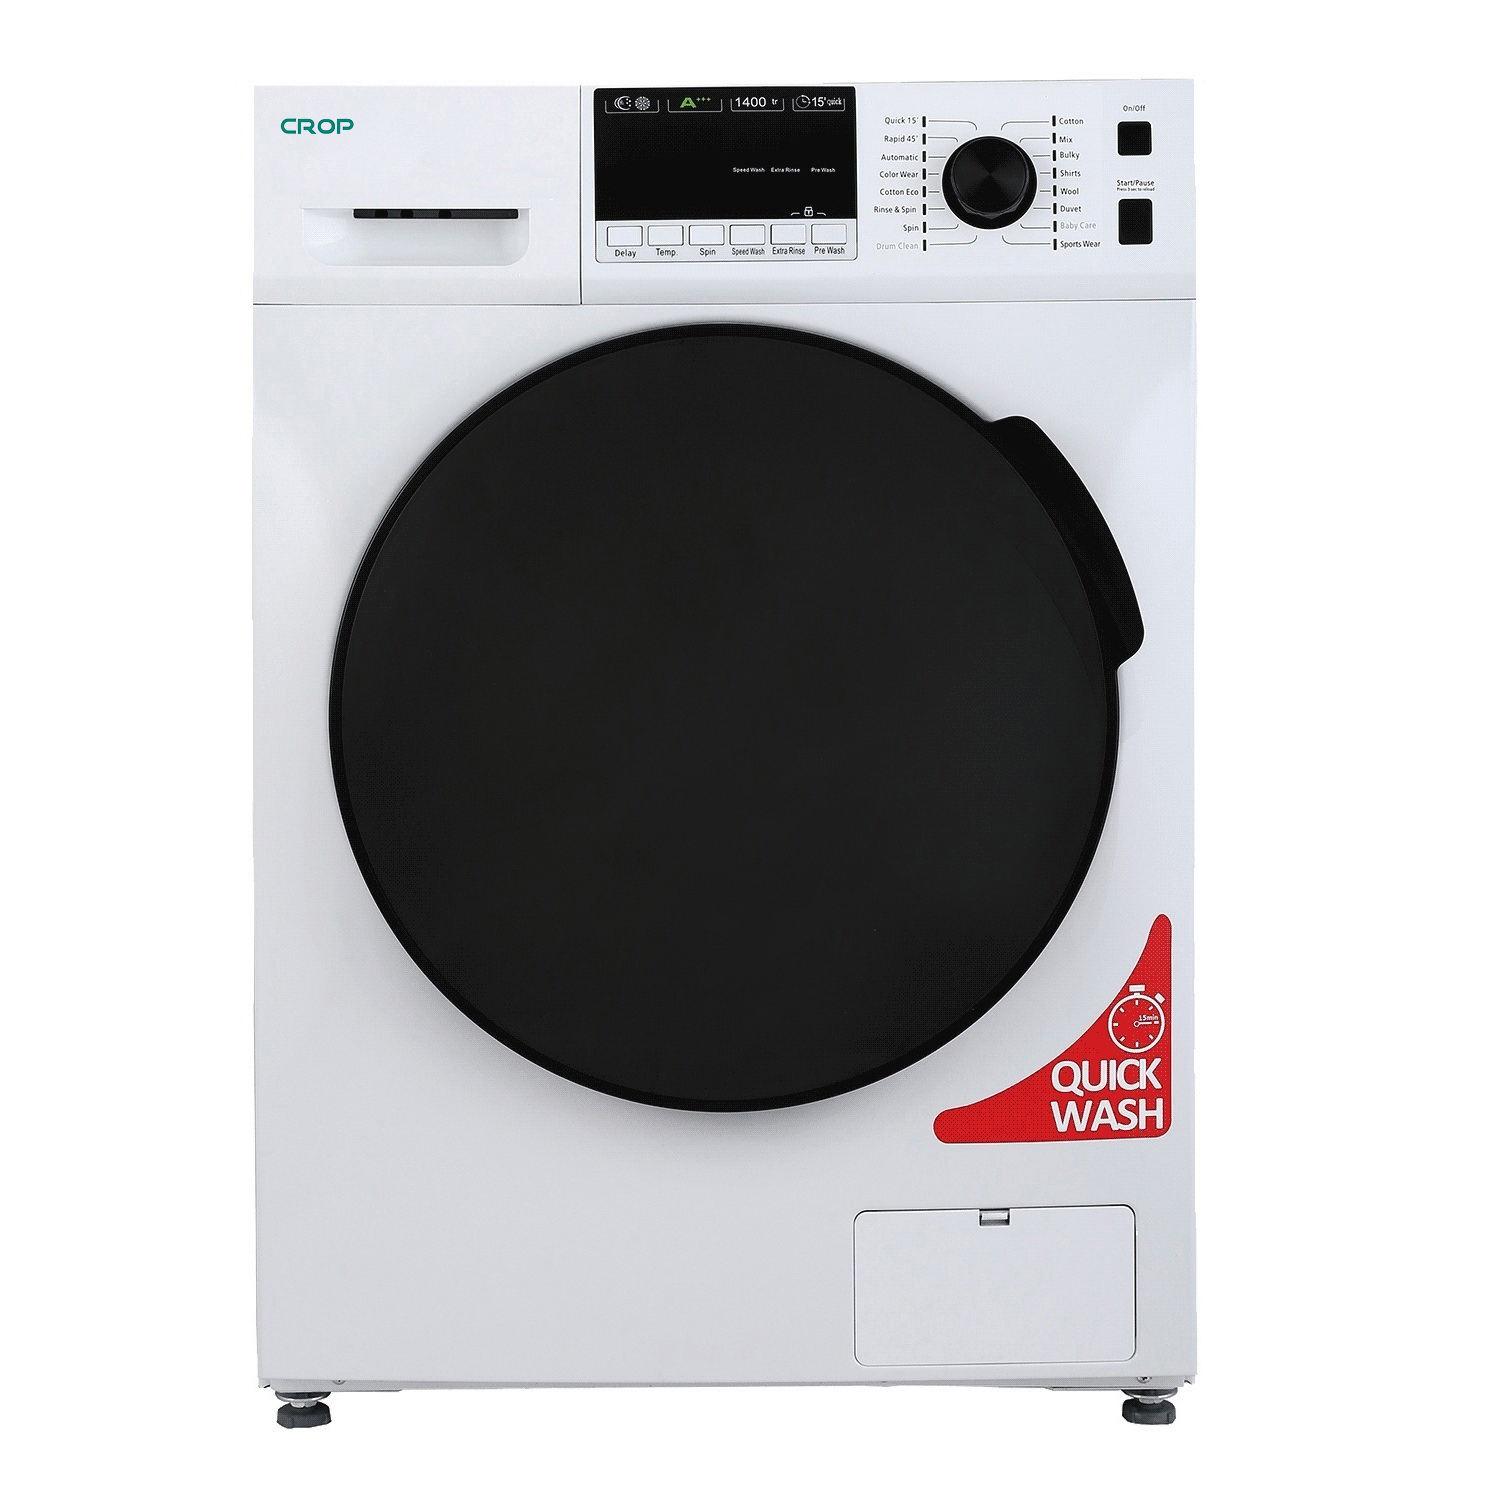 ماشین لباسشویی کروپ مدل WFT 28408 ظرفیت 8 کیلوگرم